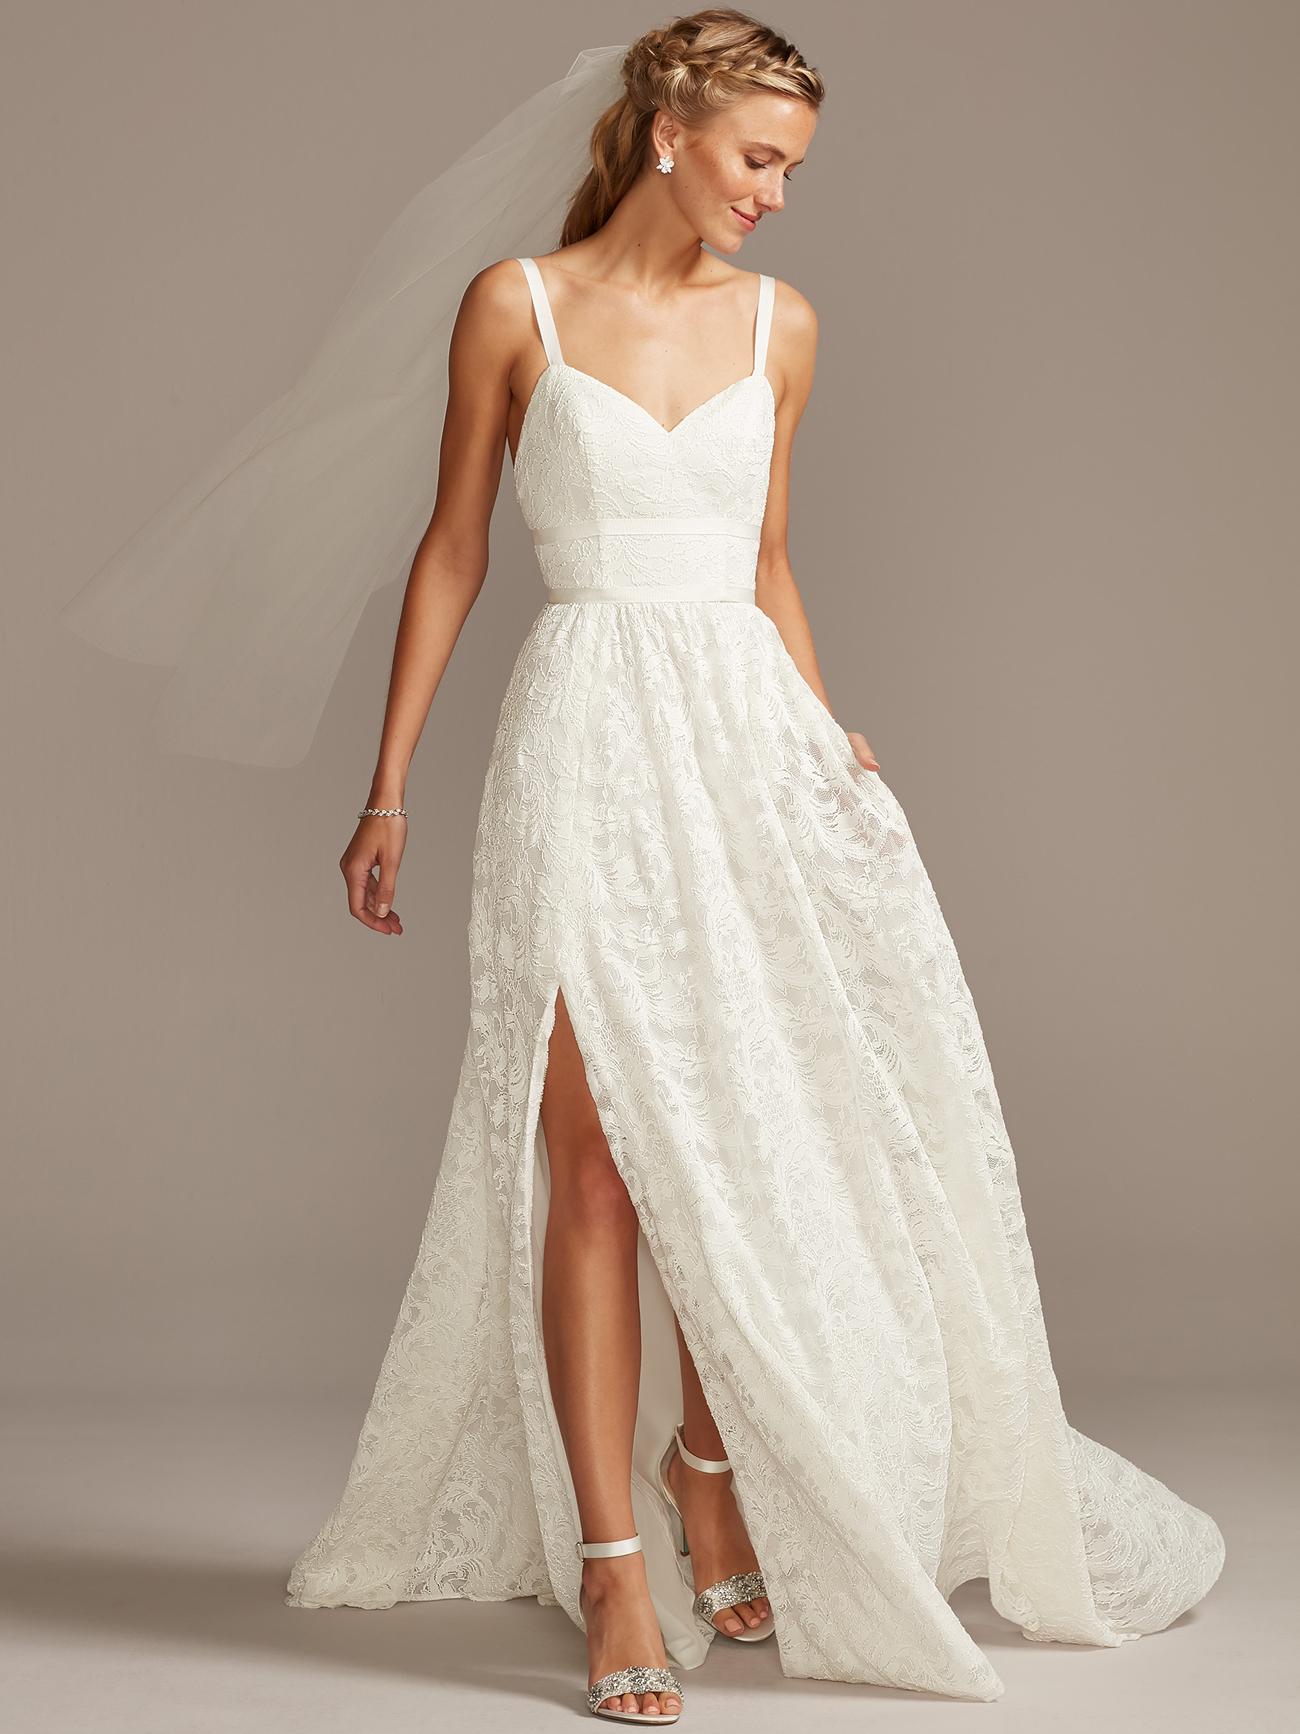 davids bridal melissa sweet side slit spaghetti strap wedding dress fall 2020